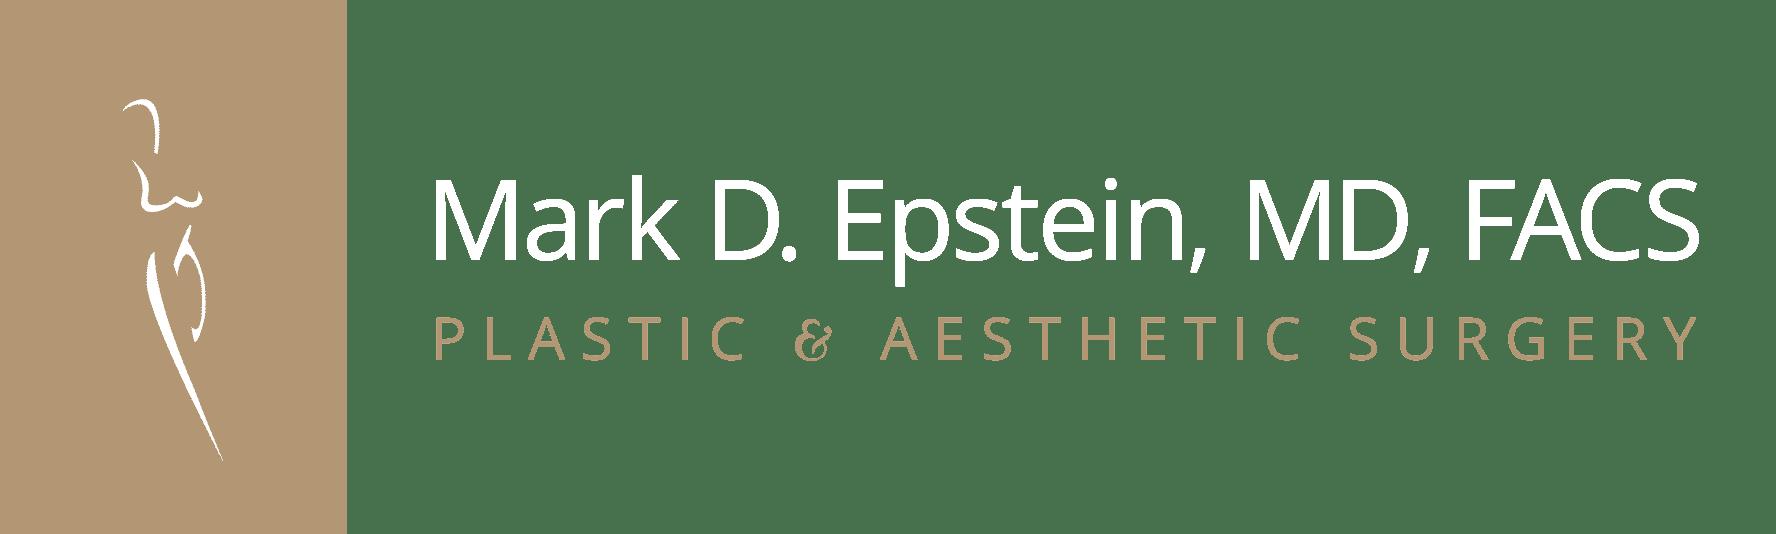 Mark D. Epstein, MD logo